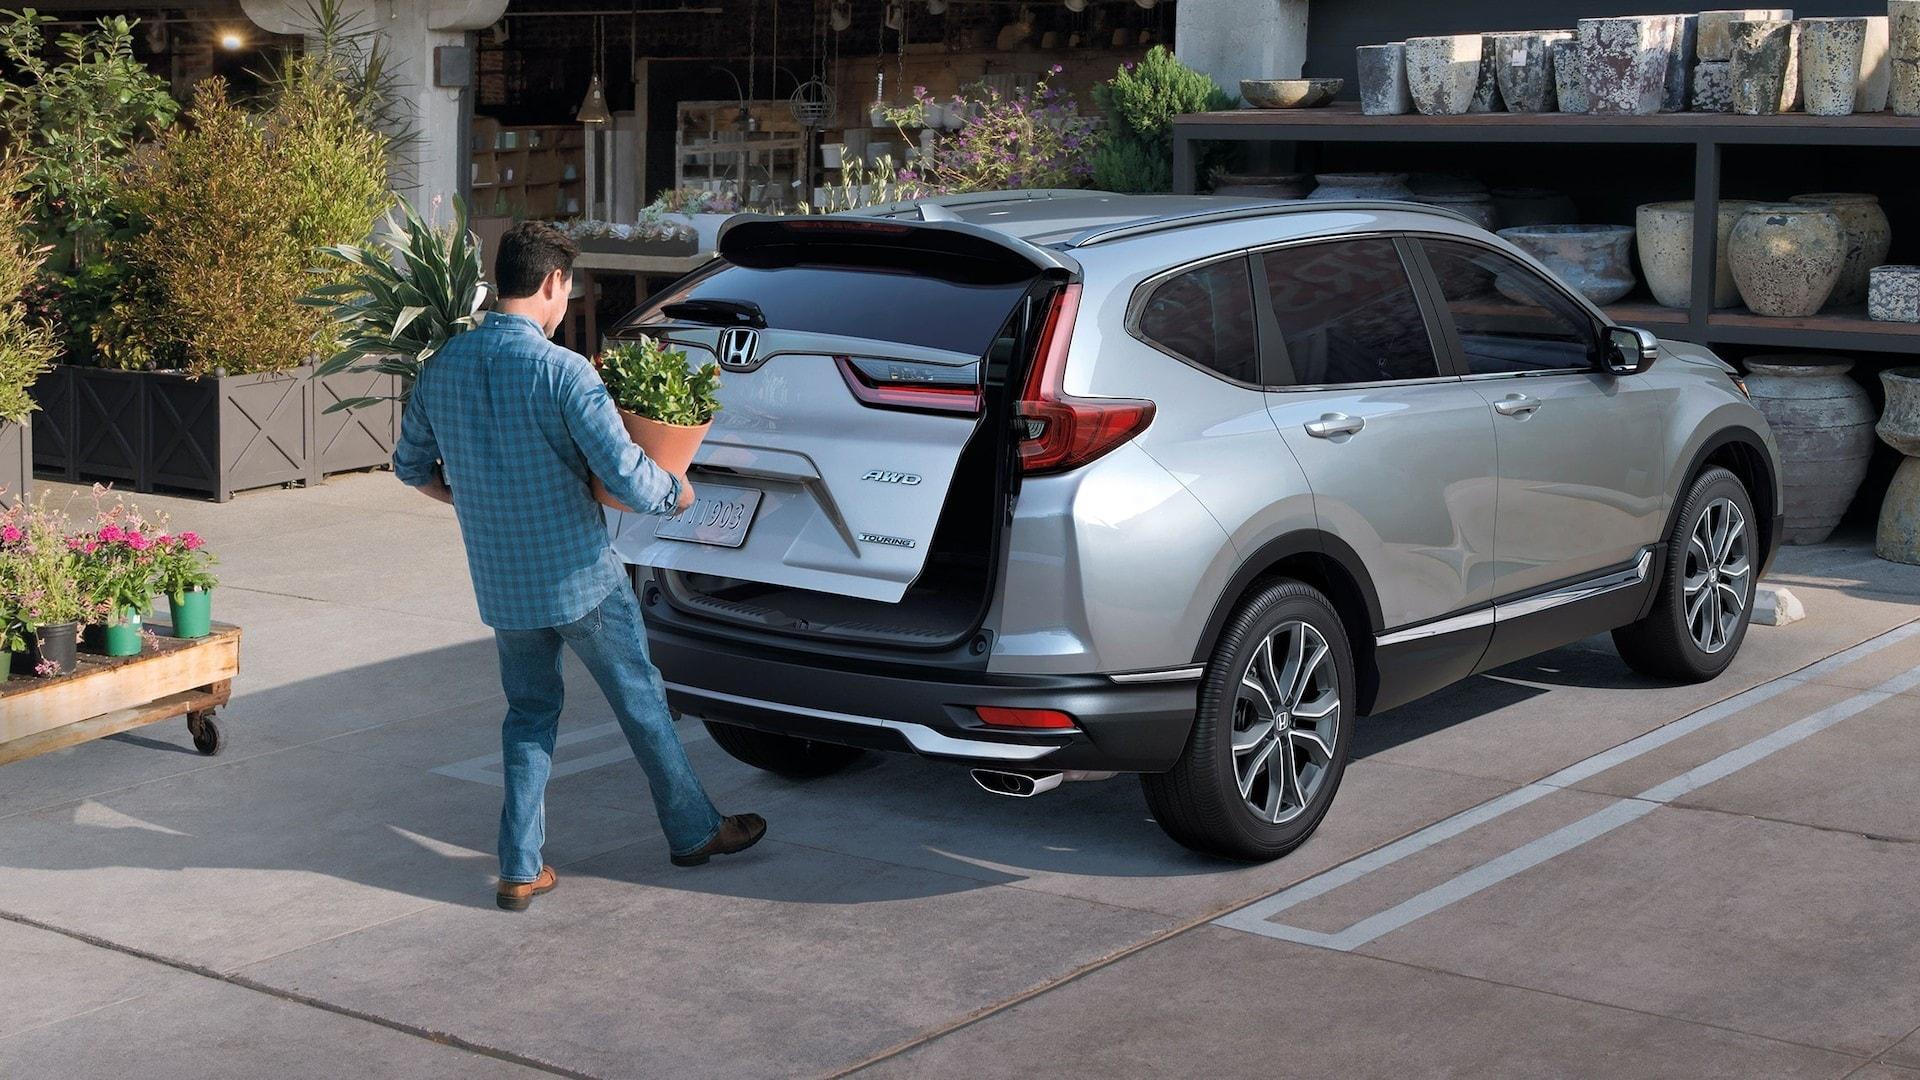 Honda CR-V Hands-Free Access Power Tailgate